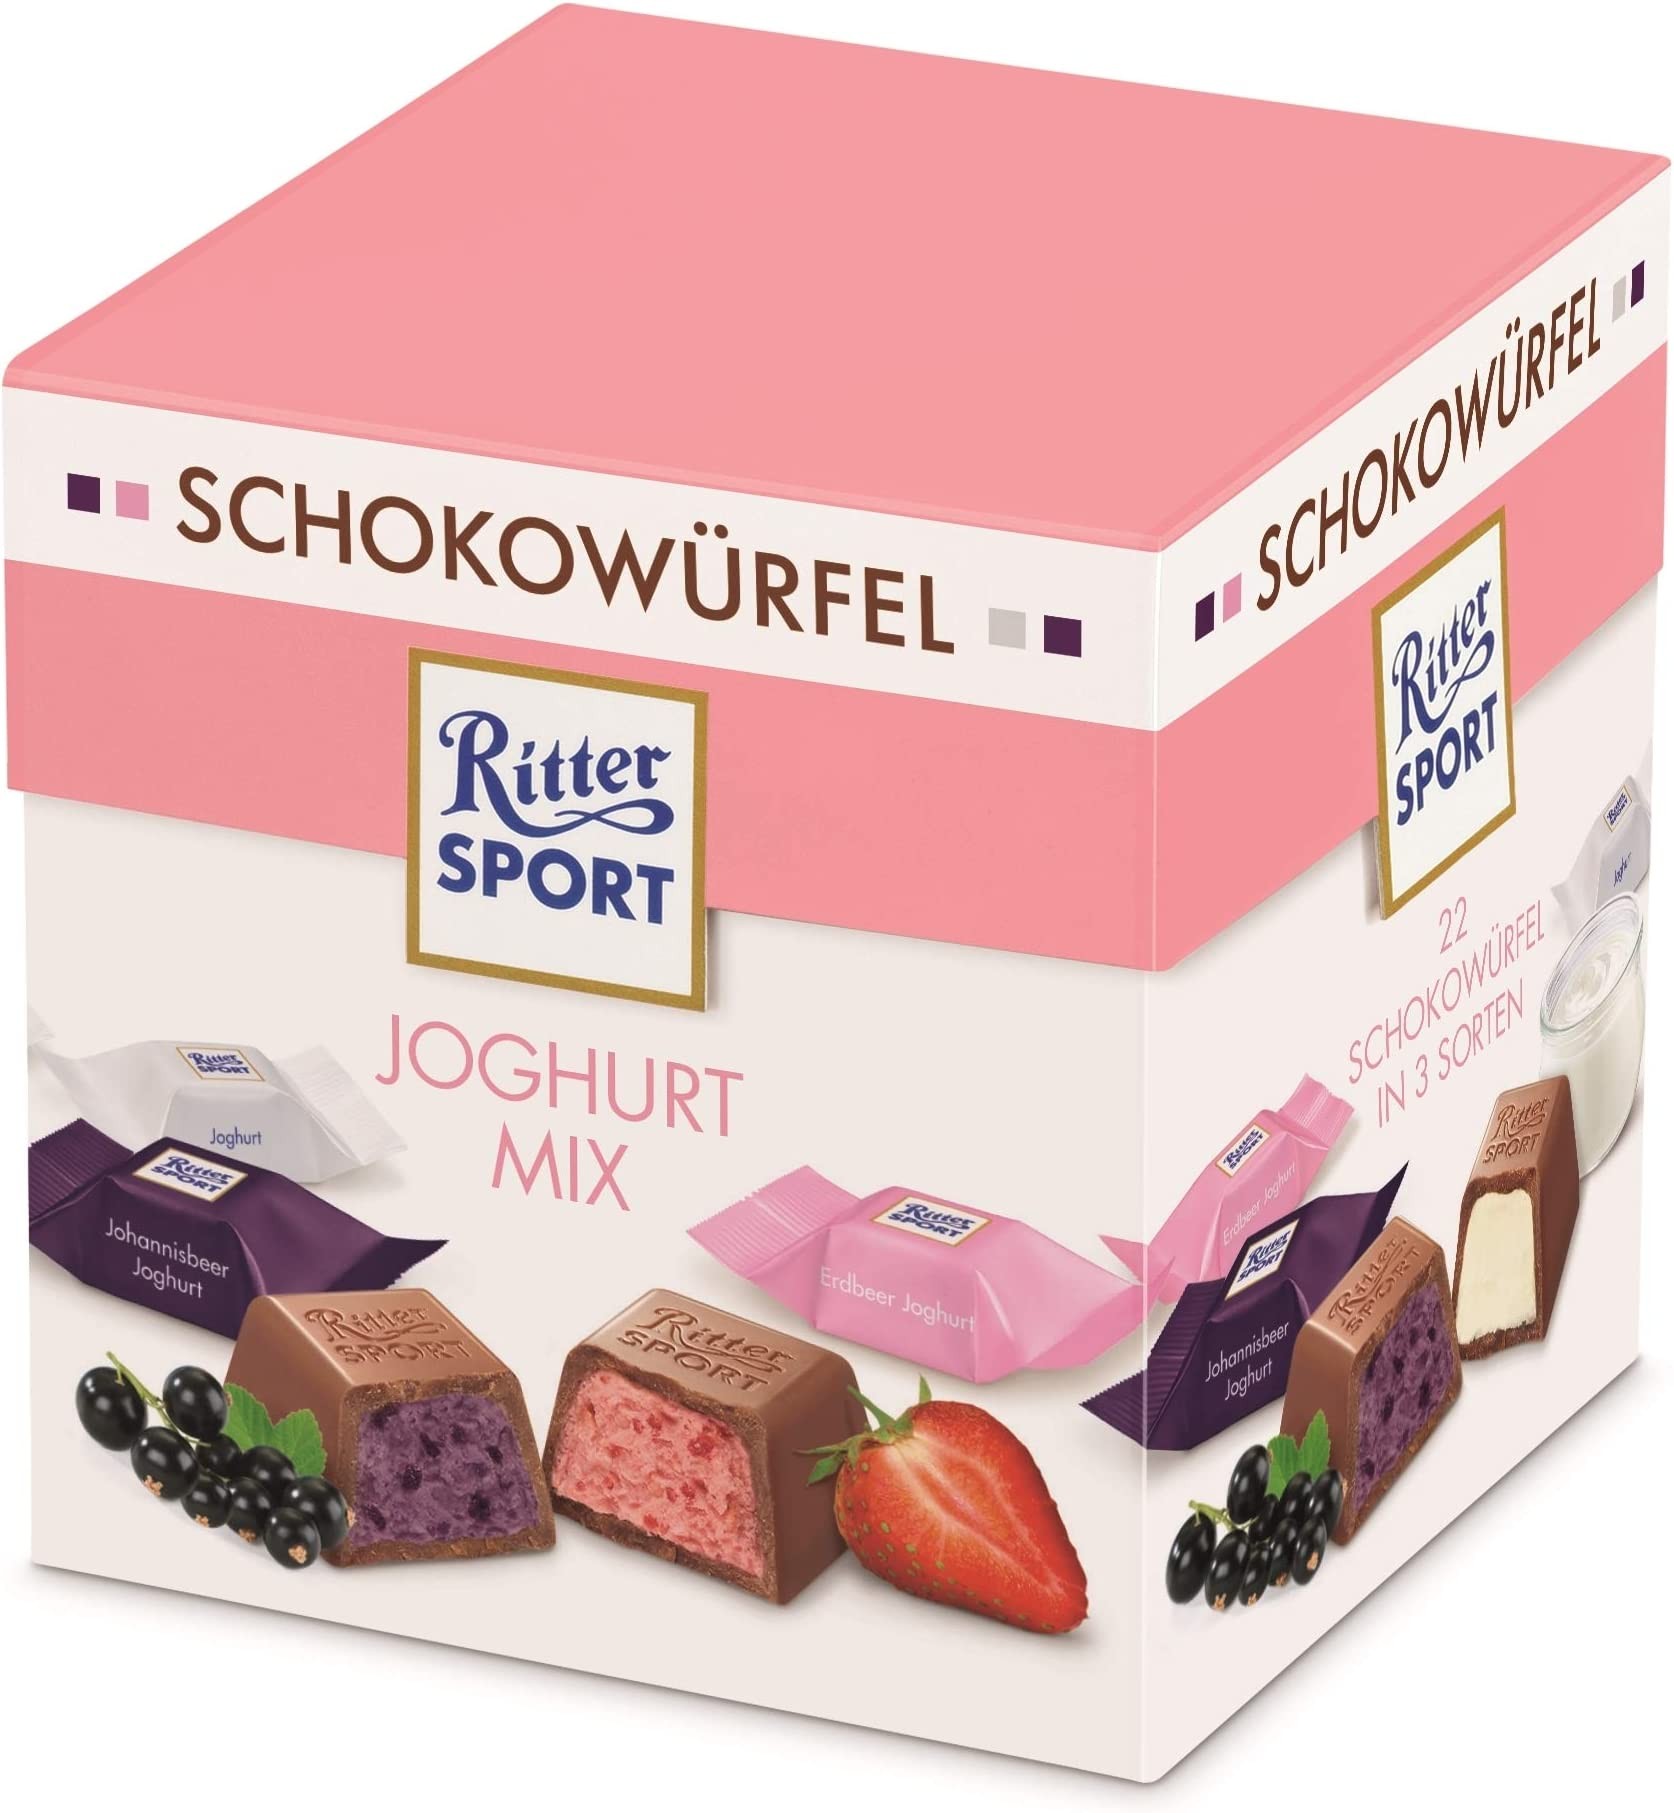 Ritter Sport Cube Yoghurt Chocolate 176 Gm Price In Uae Amazon Uae Kanbkam